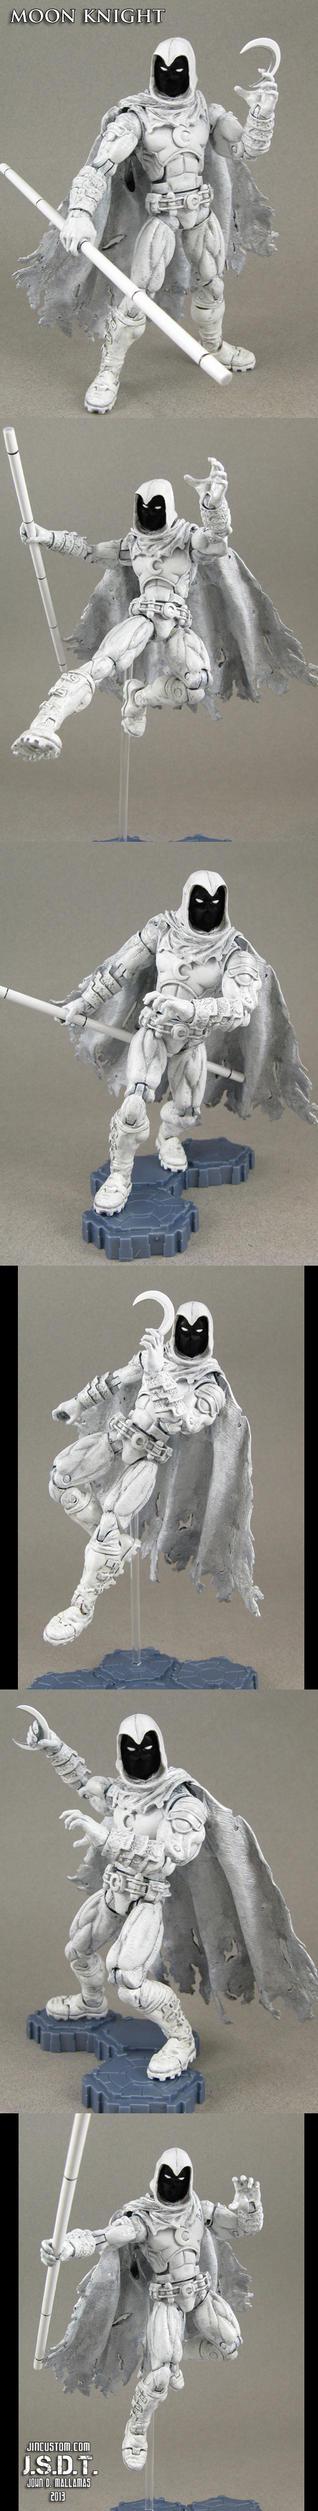 Custom Marvel Legends Moon Knight figure by Jin-Saotome